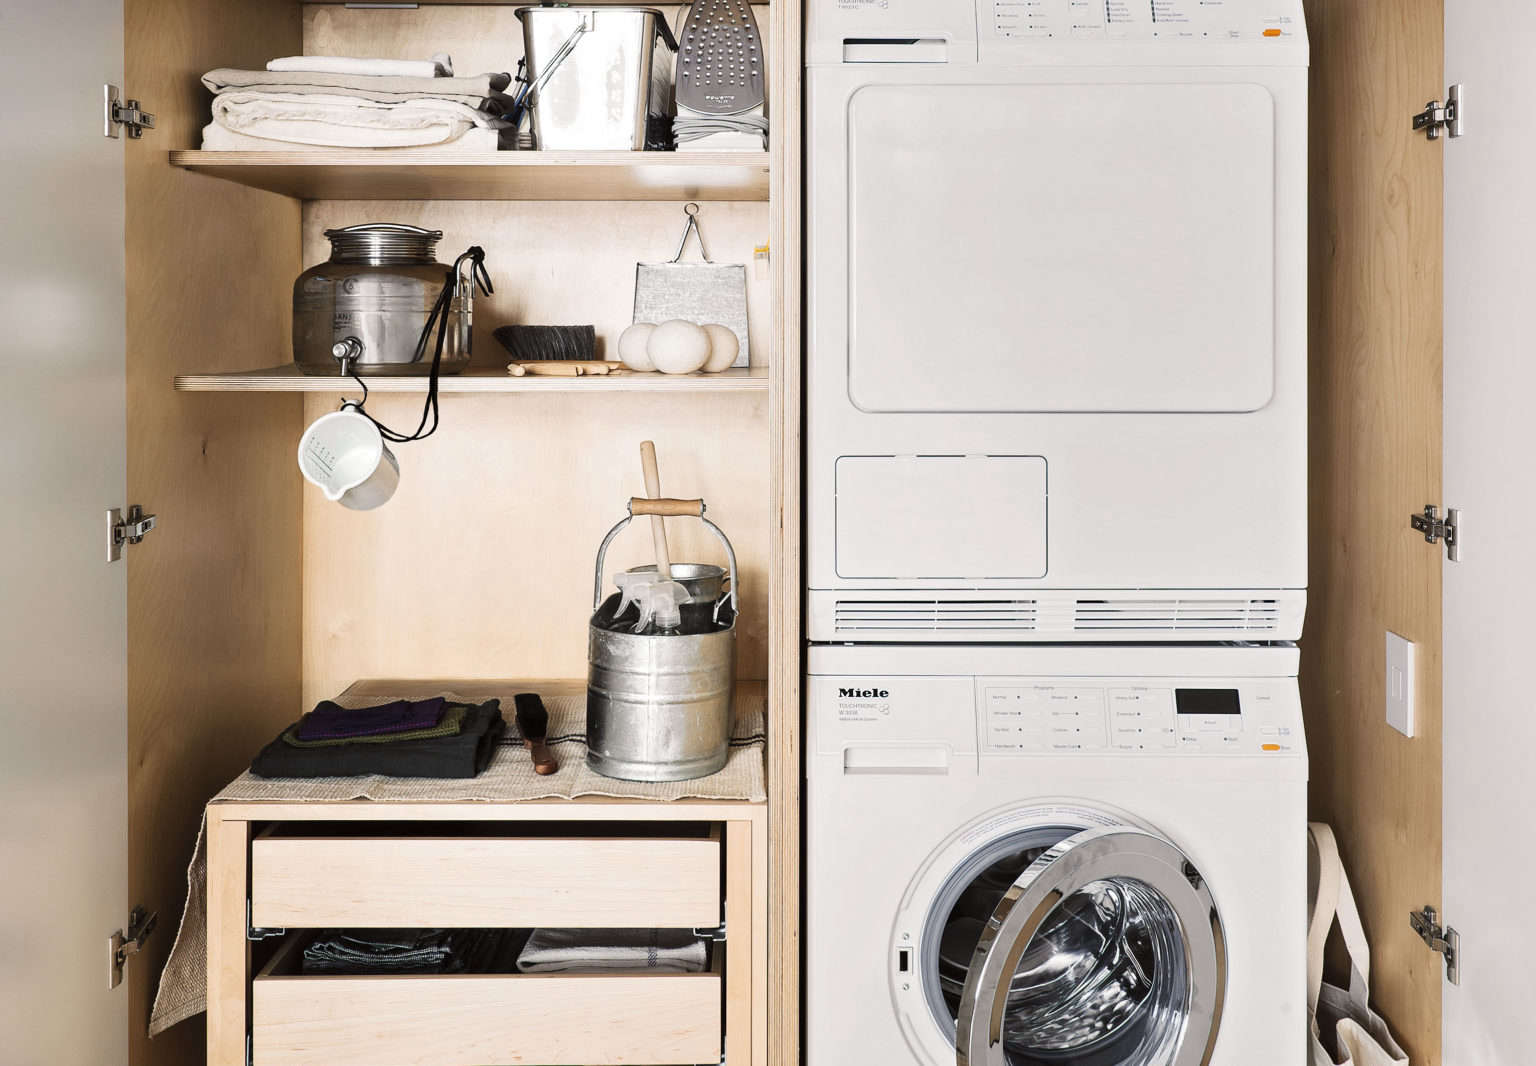 Solveig Fernlund Laundry Room Photo by Matthew Williams Stying Alexa Hotz